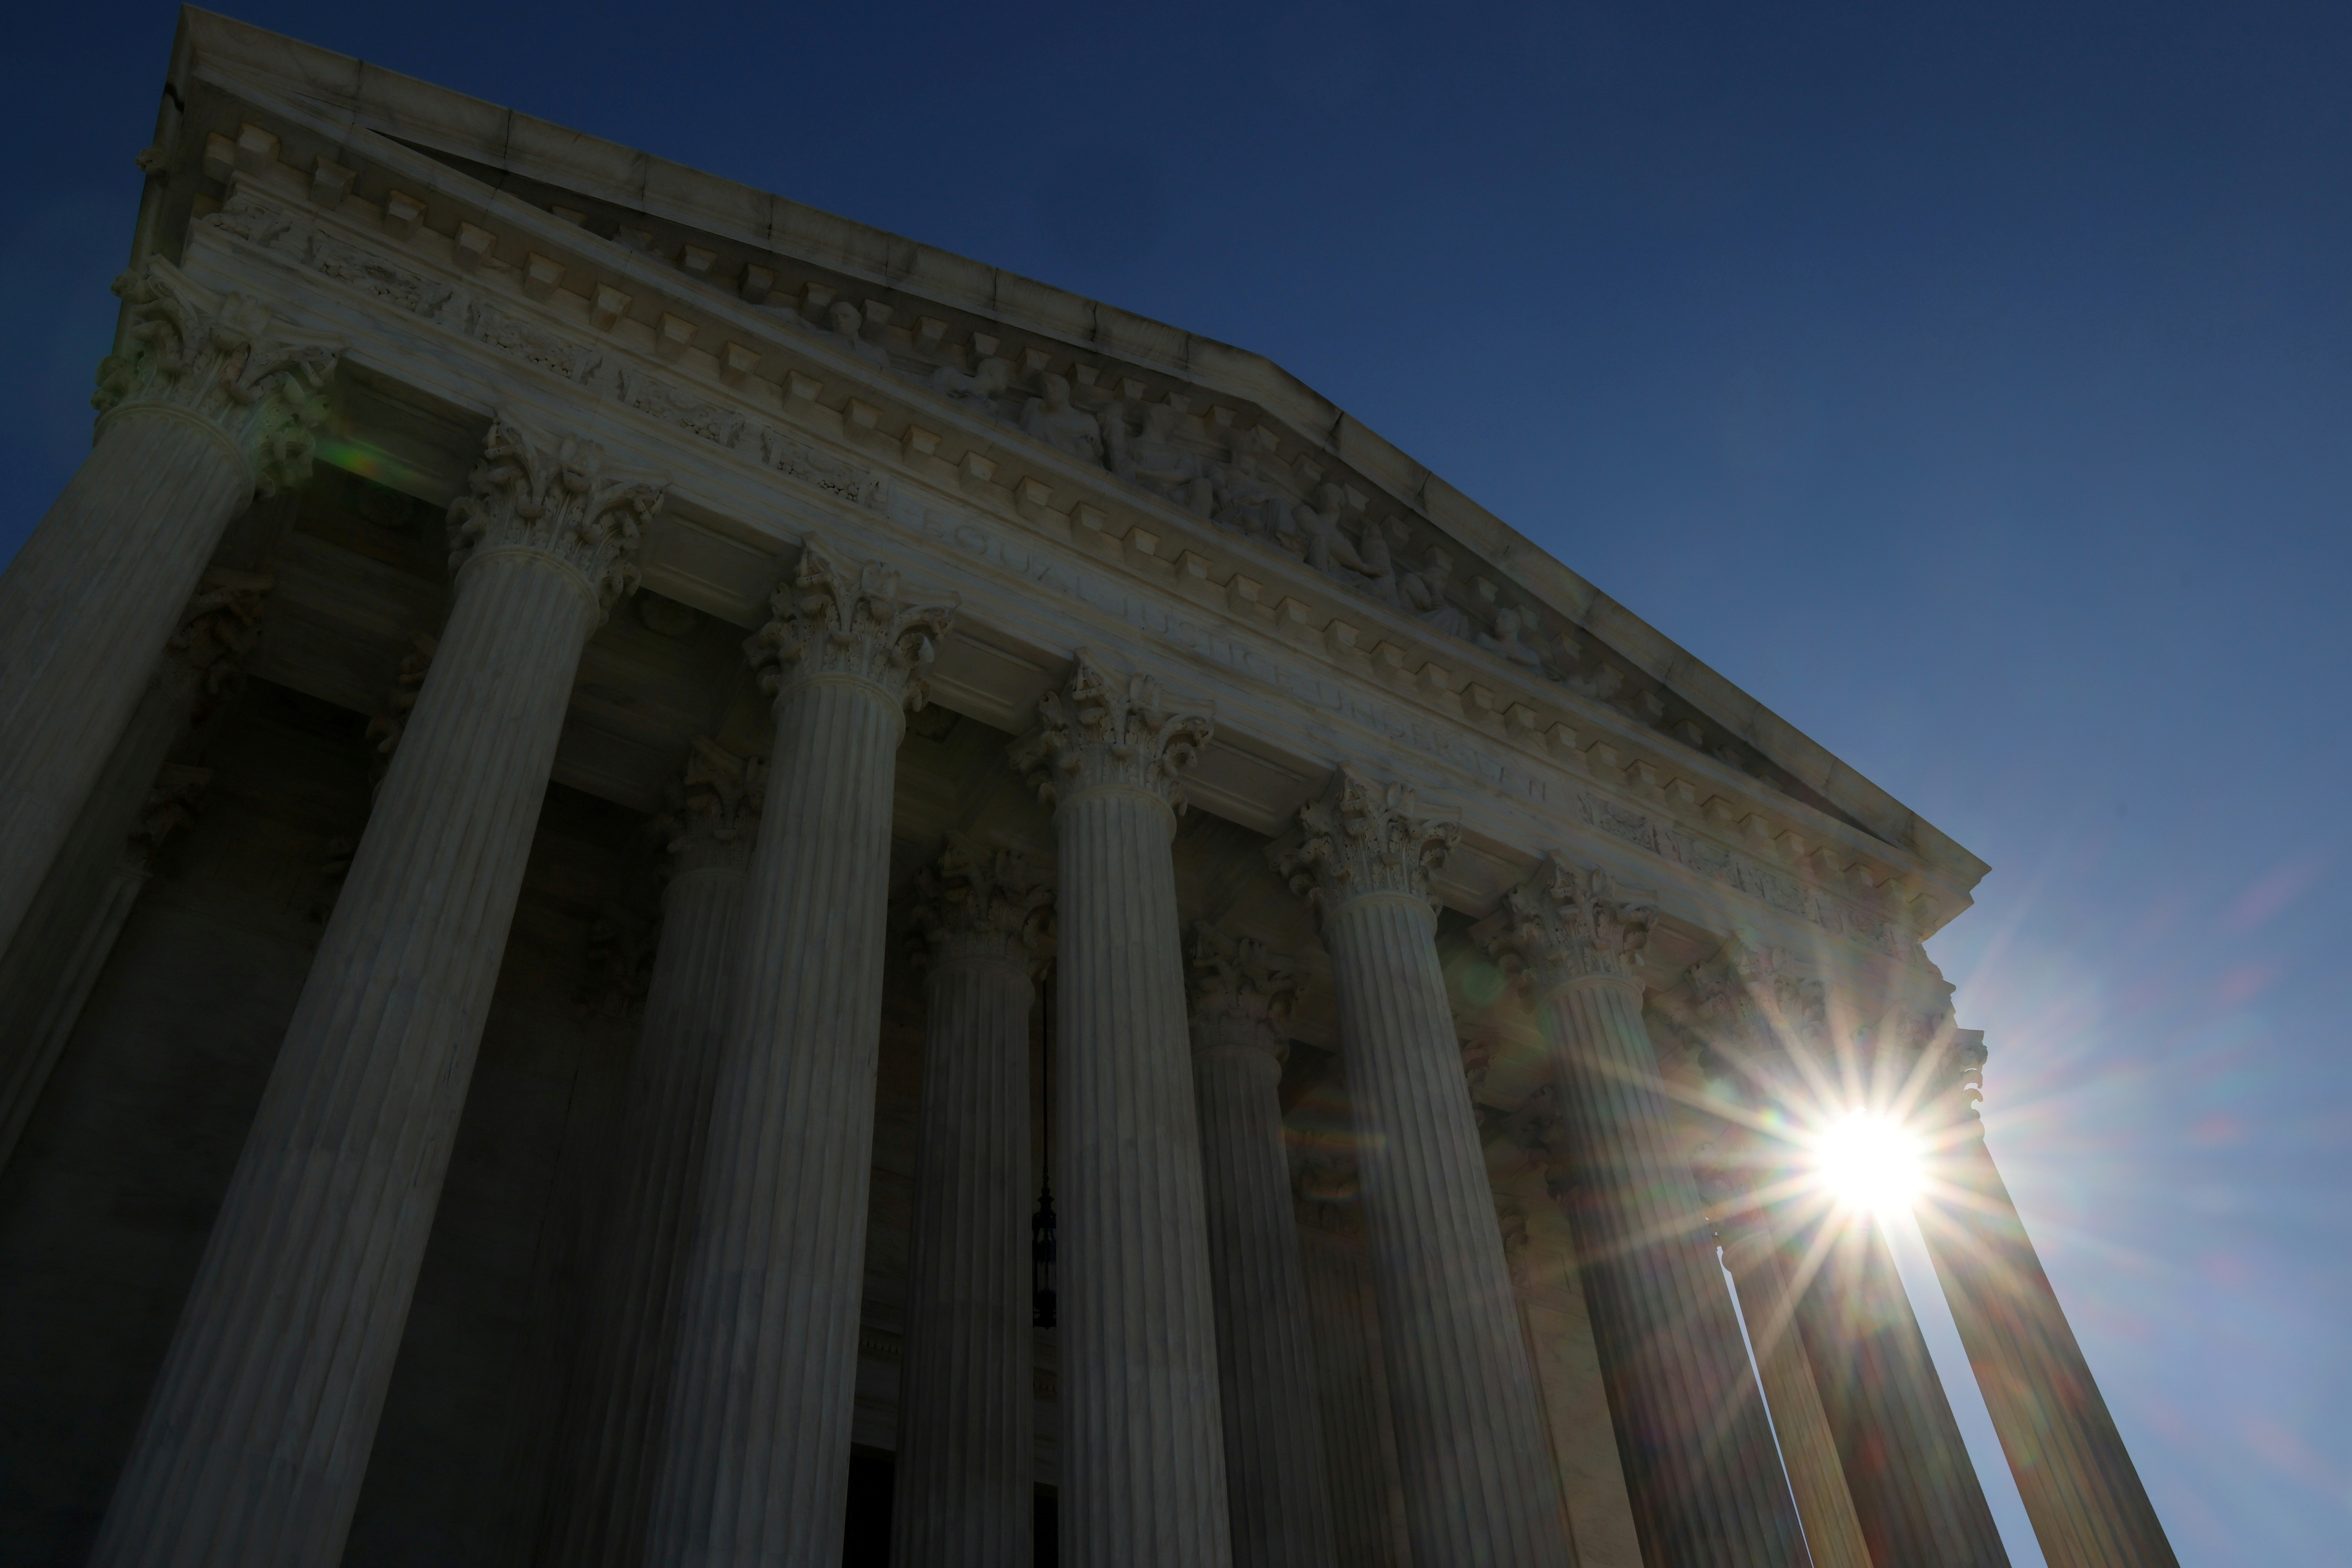 The U.S. Supreme Court building, Washington, U.S. November 4, 2020.  REUTERS/Jonathan Ernst